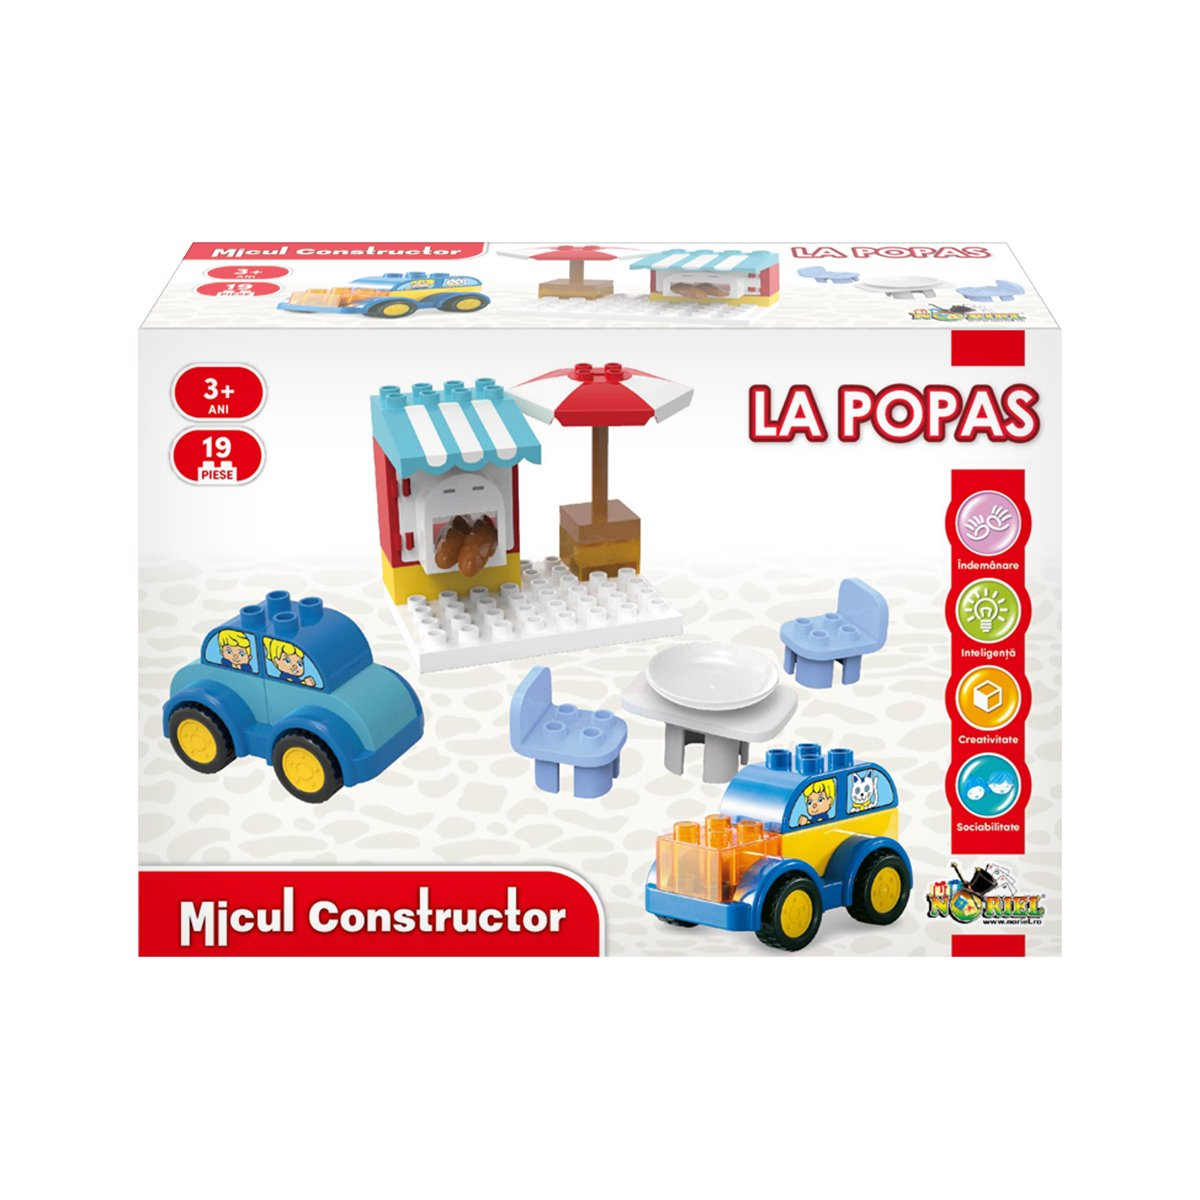 Jucarie de constructie Micul Constructor, La Popas